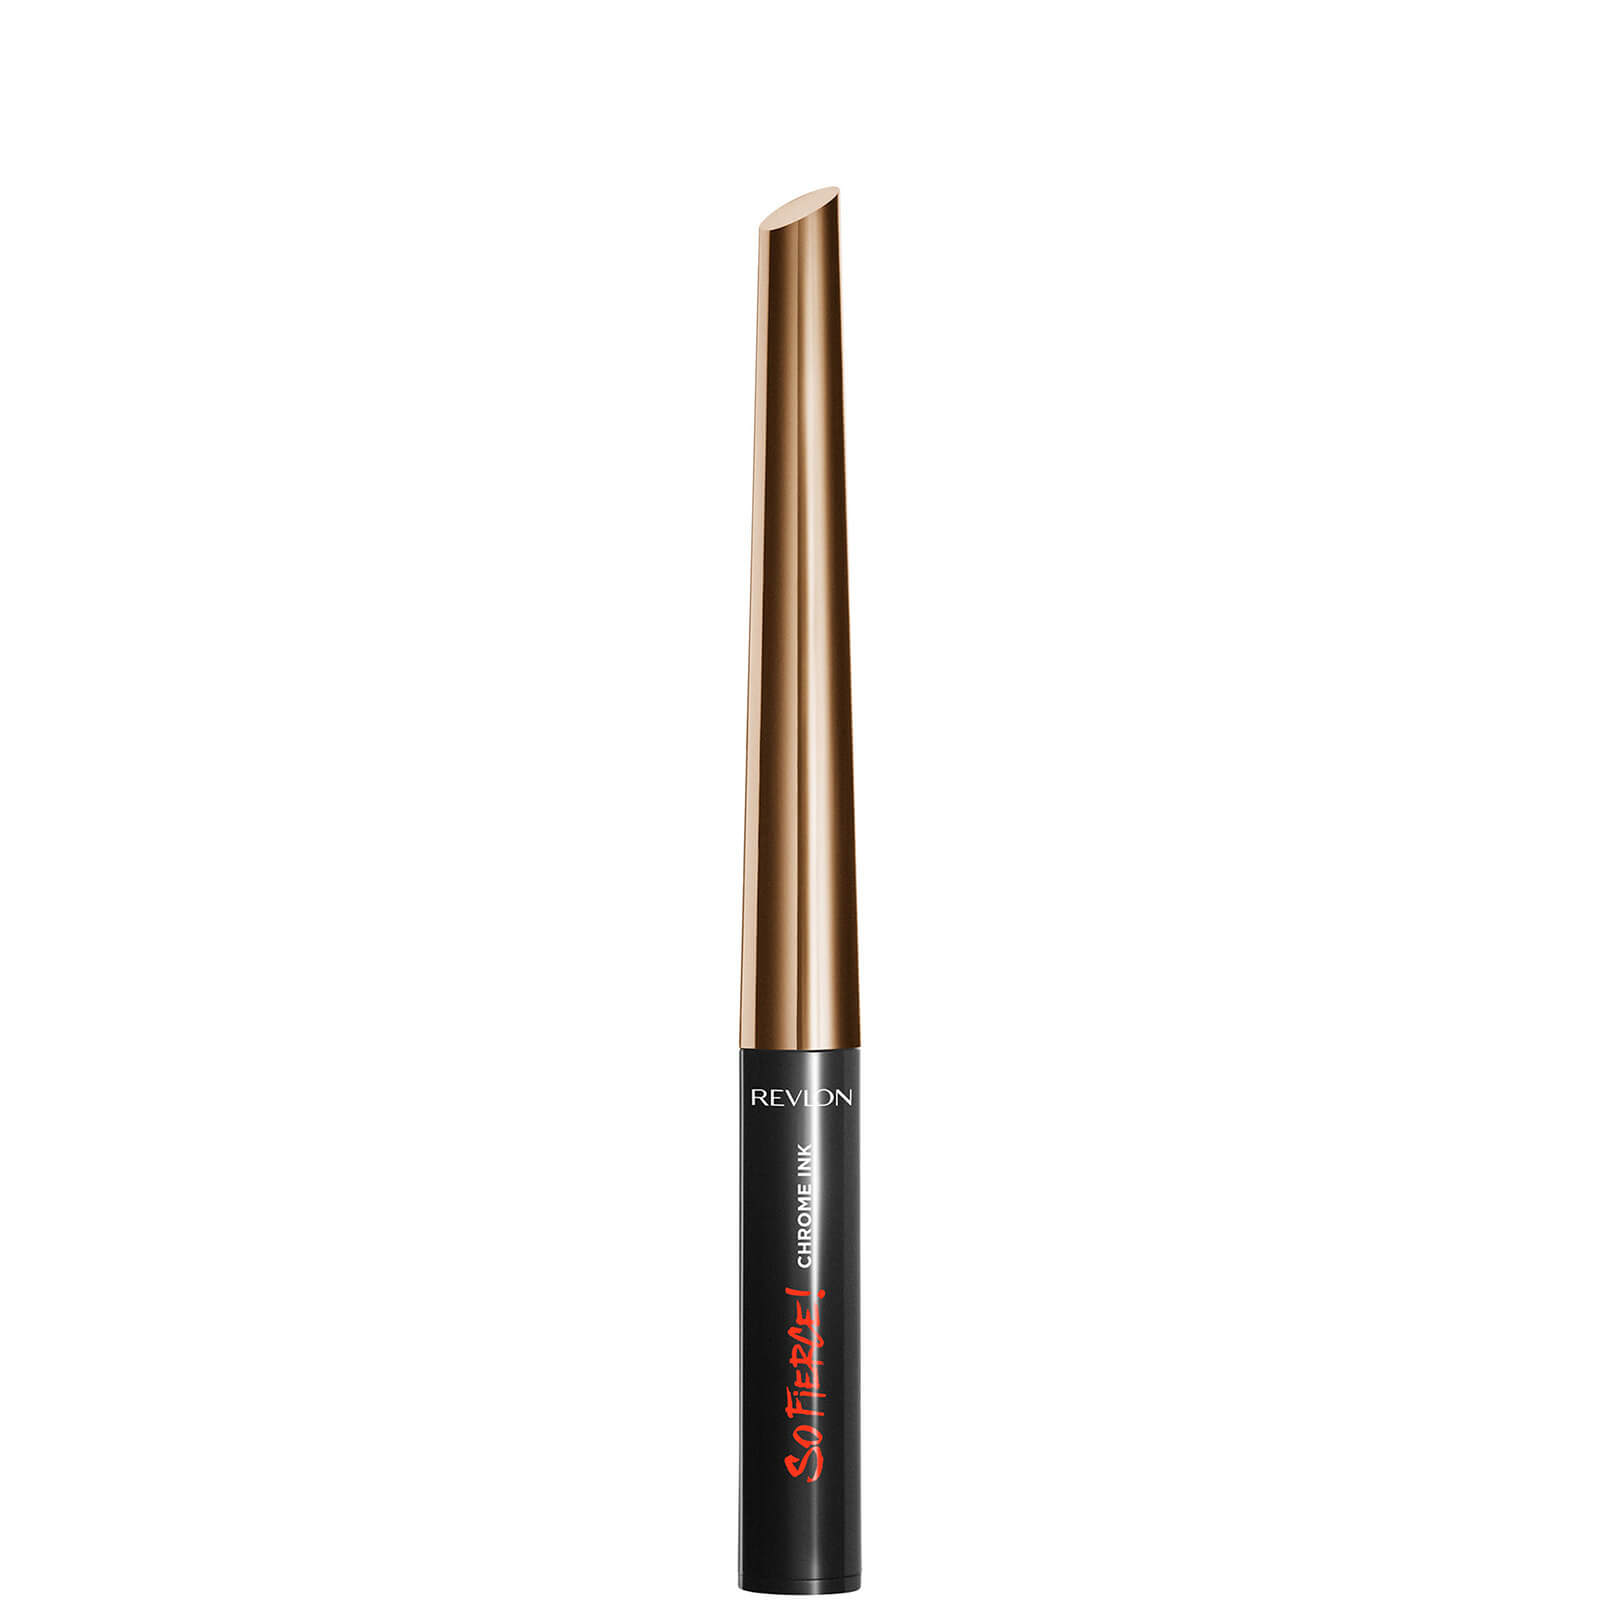 Купить Revlon So Fierce Chrome Ink Liquid Eyeliner 0.9g (Various Shades) - Bronzage